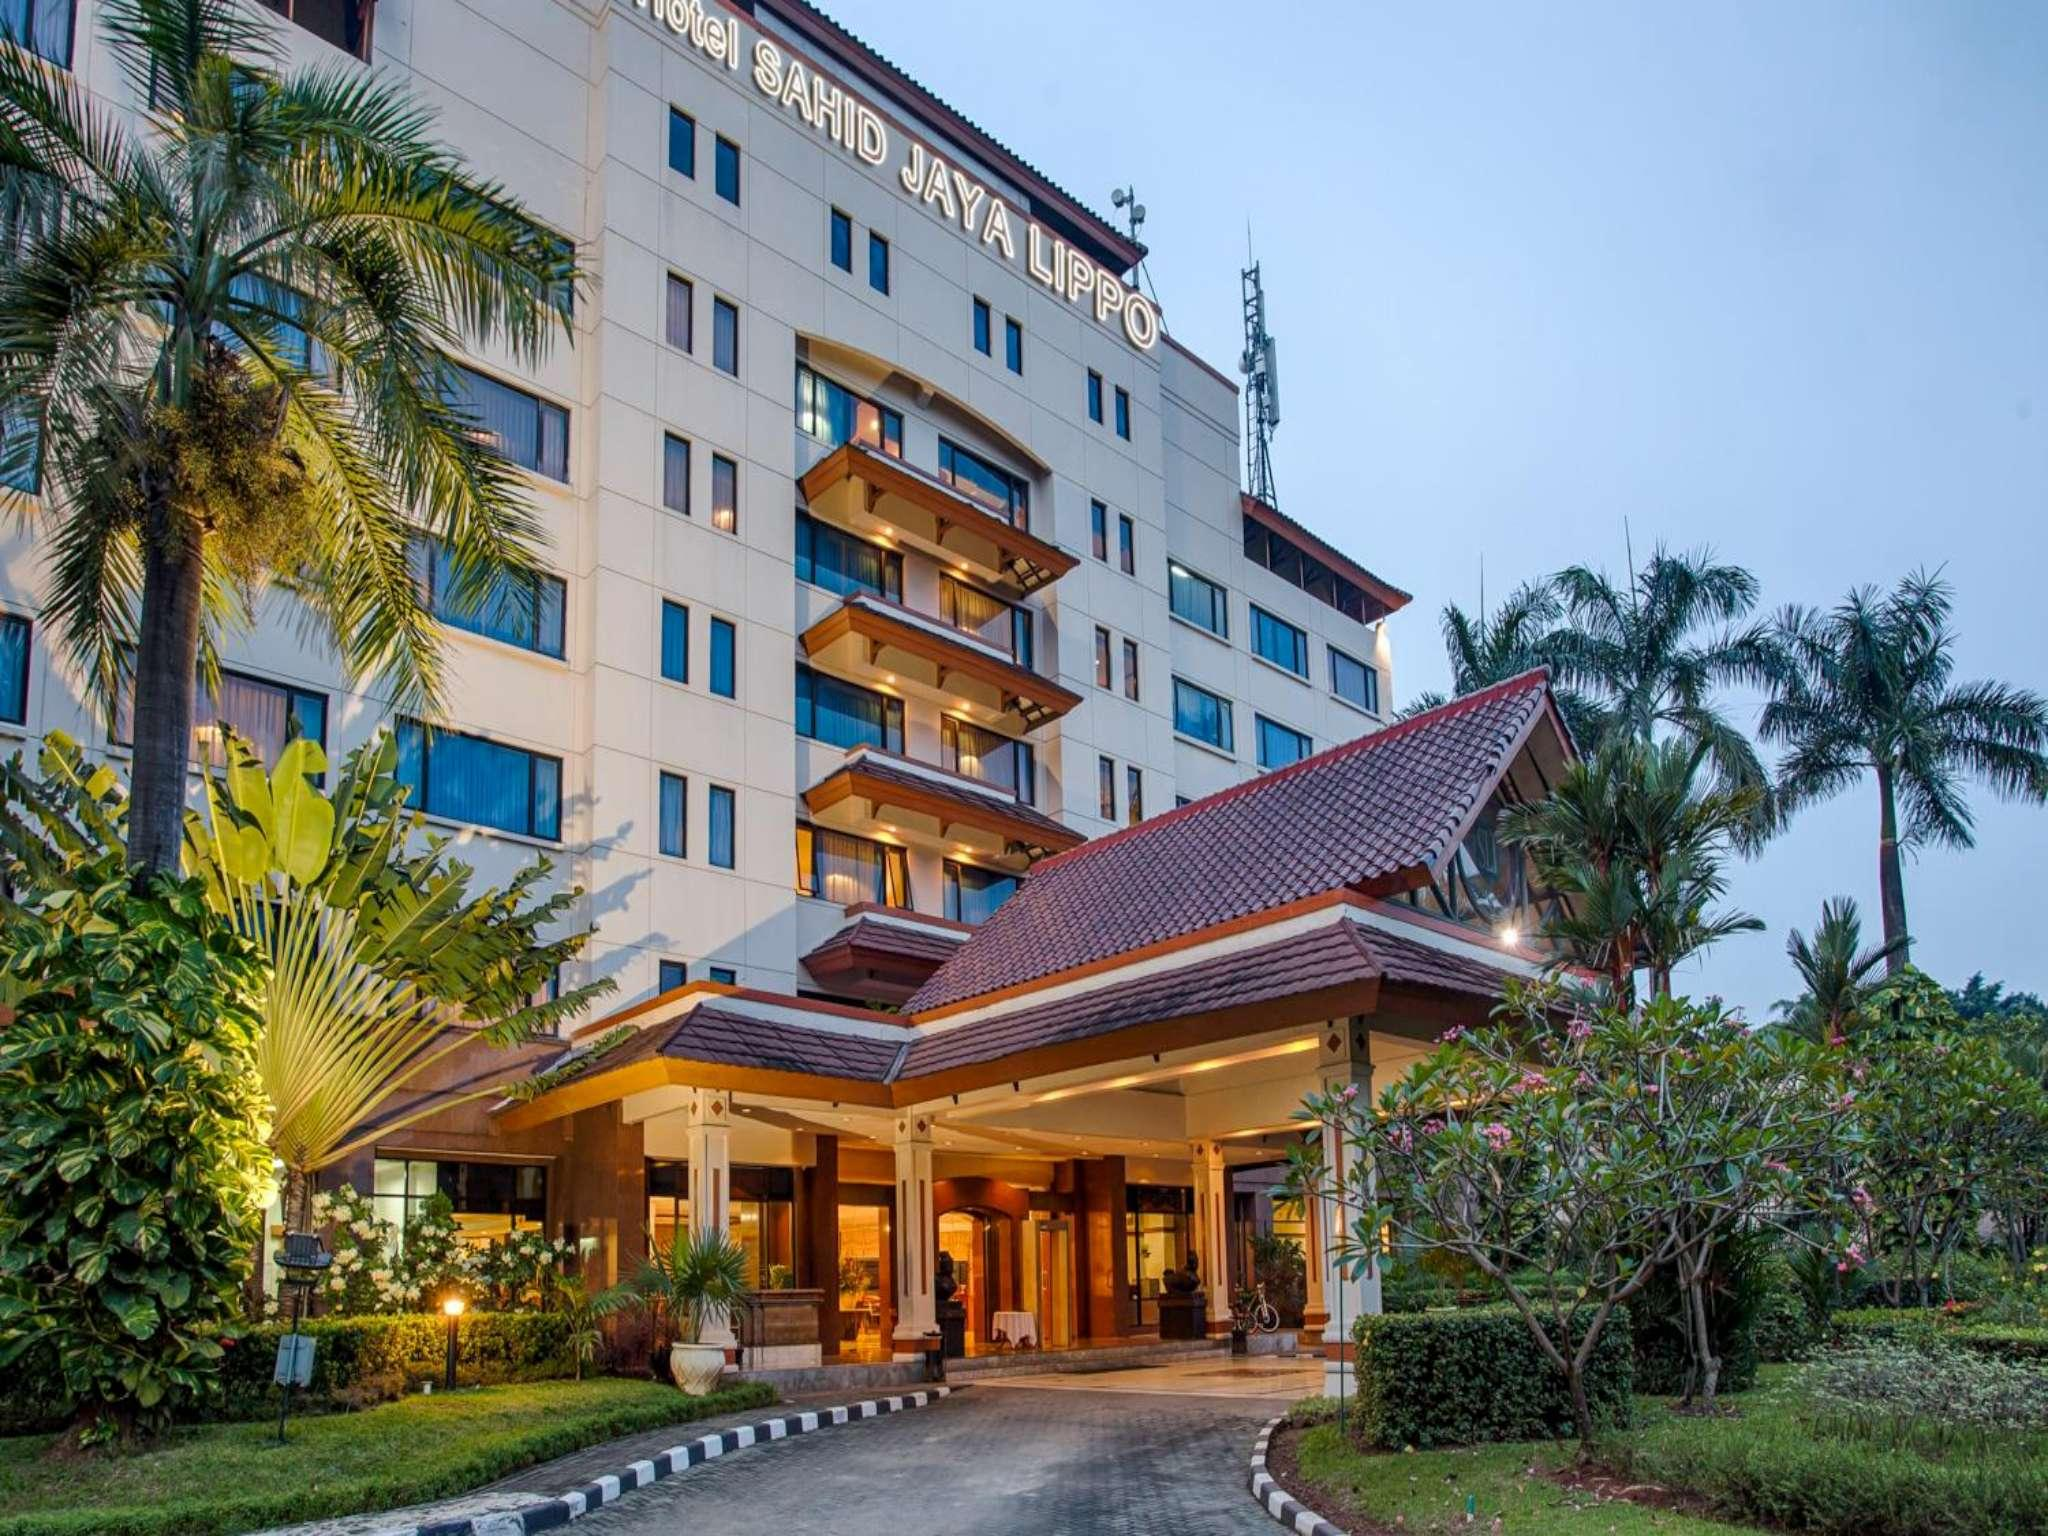 hotels near waterboom lippo cikarang park cikarang best hotel rh agoda com